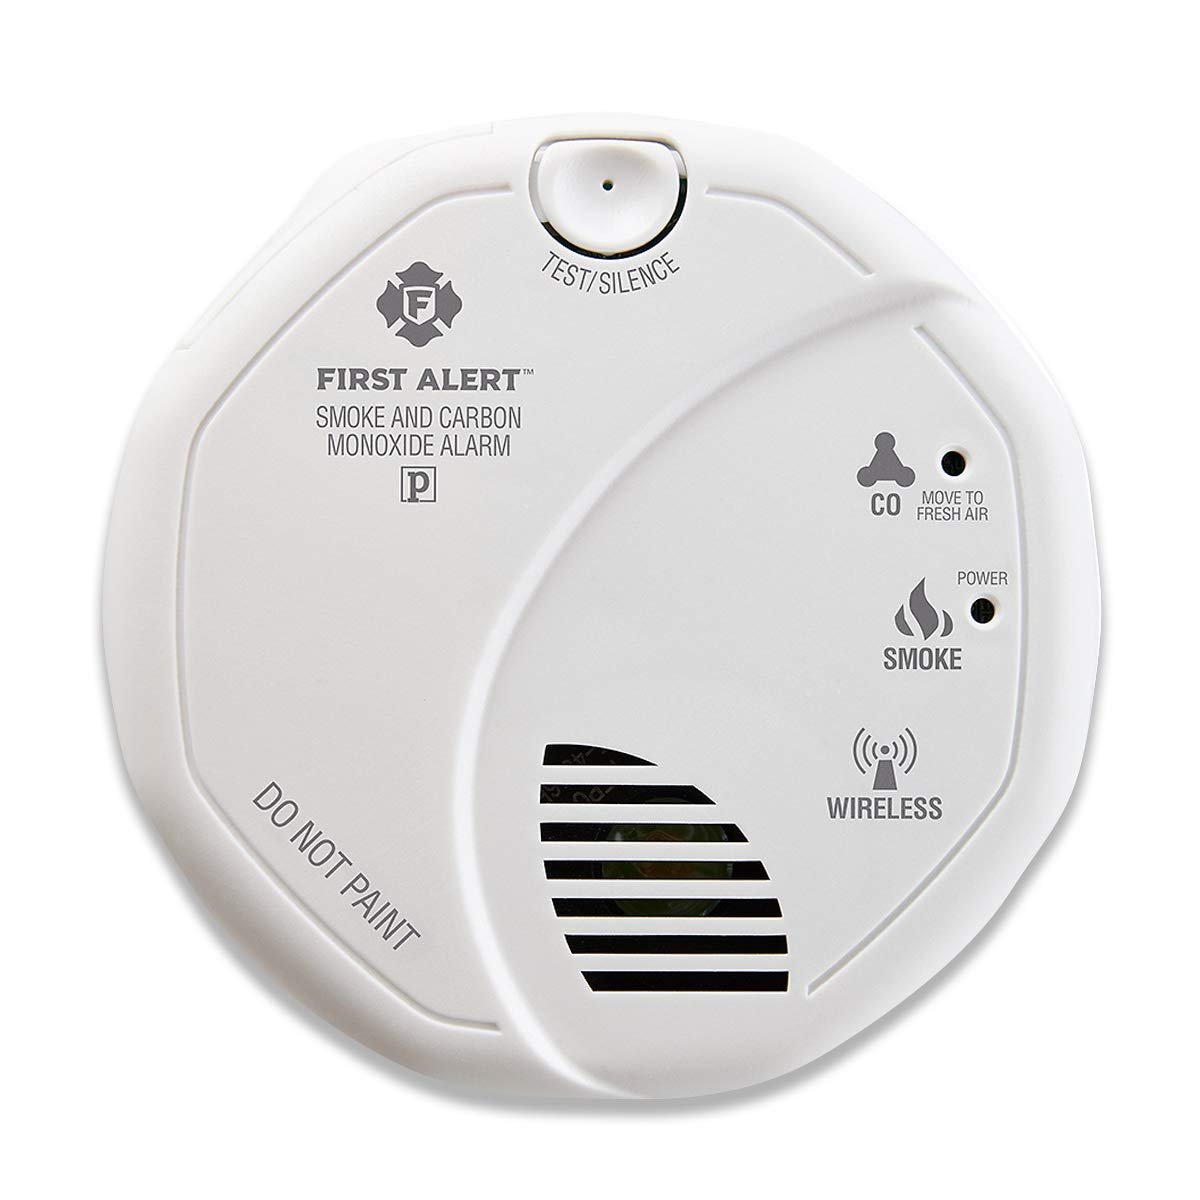 First Alert 2-in-1 Z-Wave Wireless Smoke Detector & Carbon Monoxide Alarm, Battery Operated (Renewed)